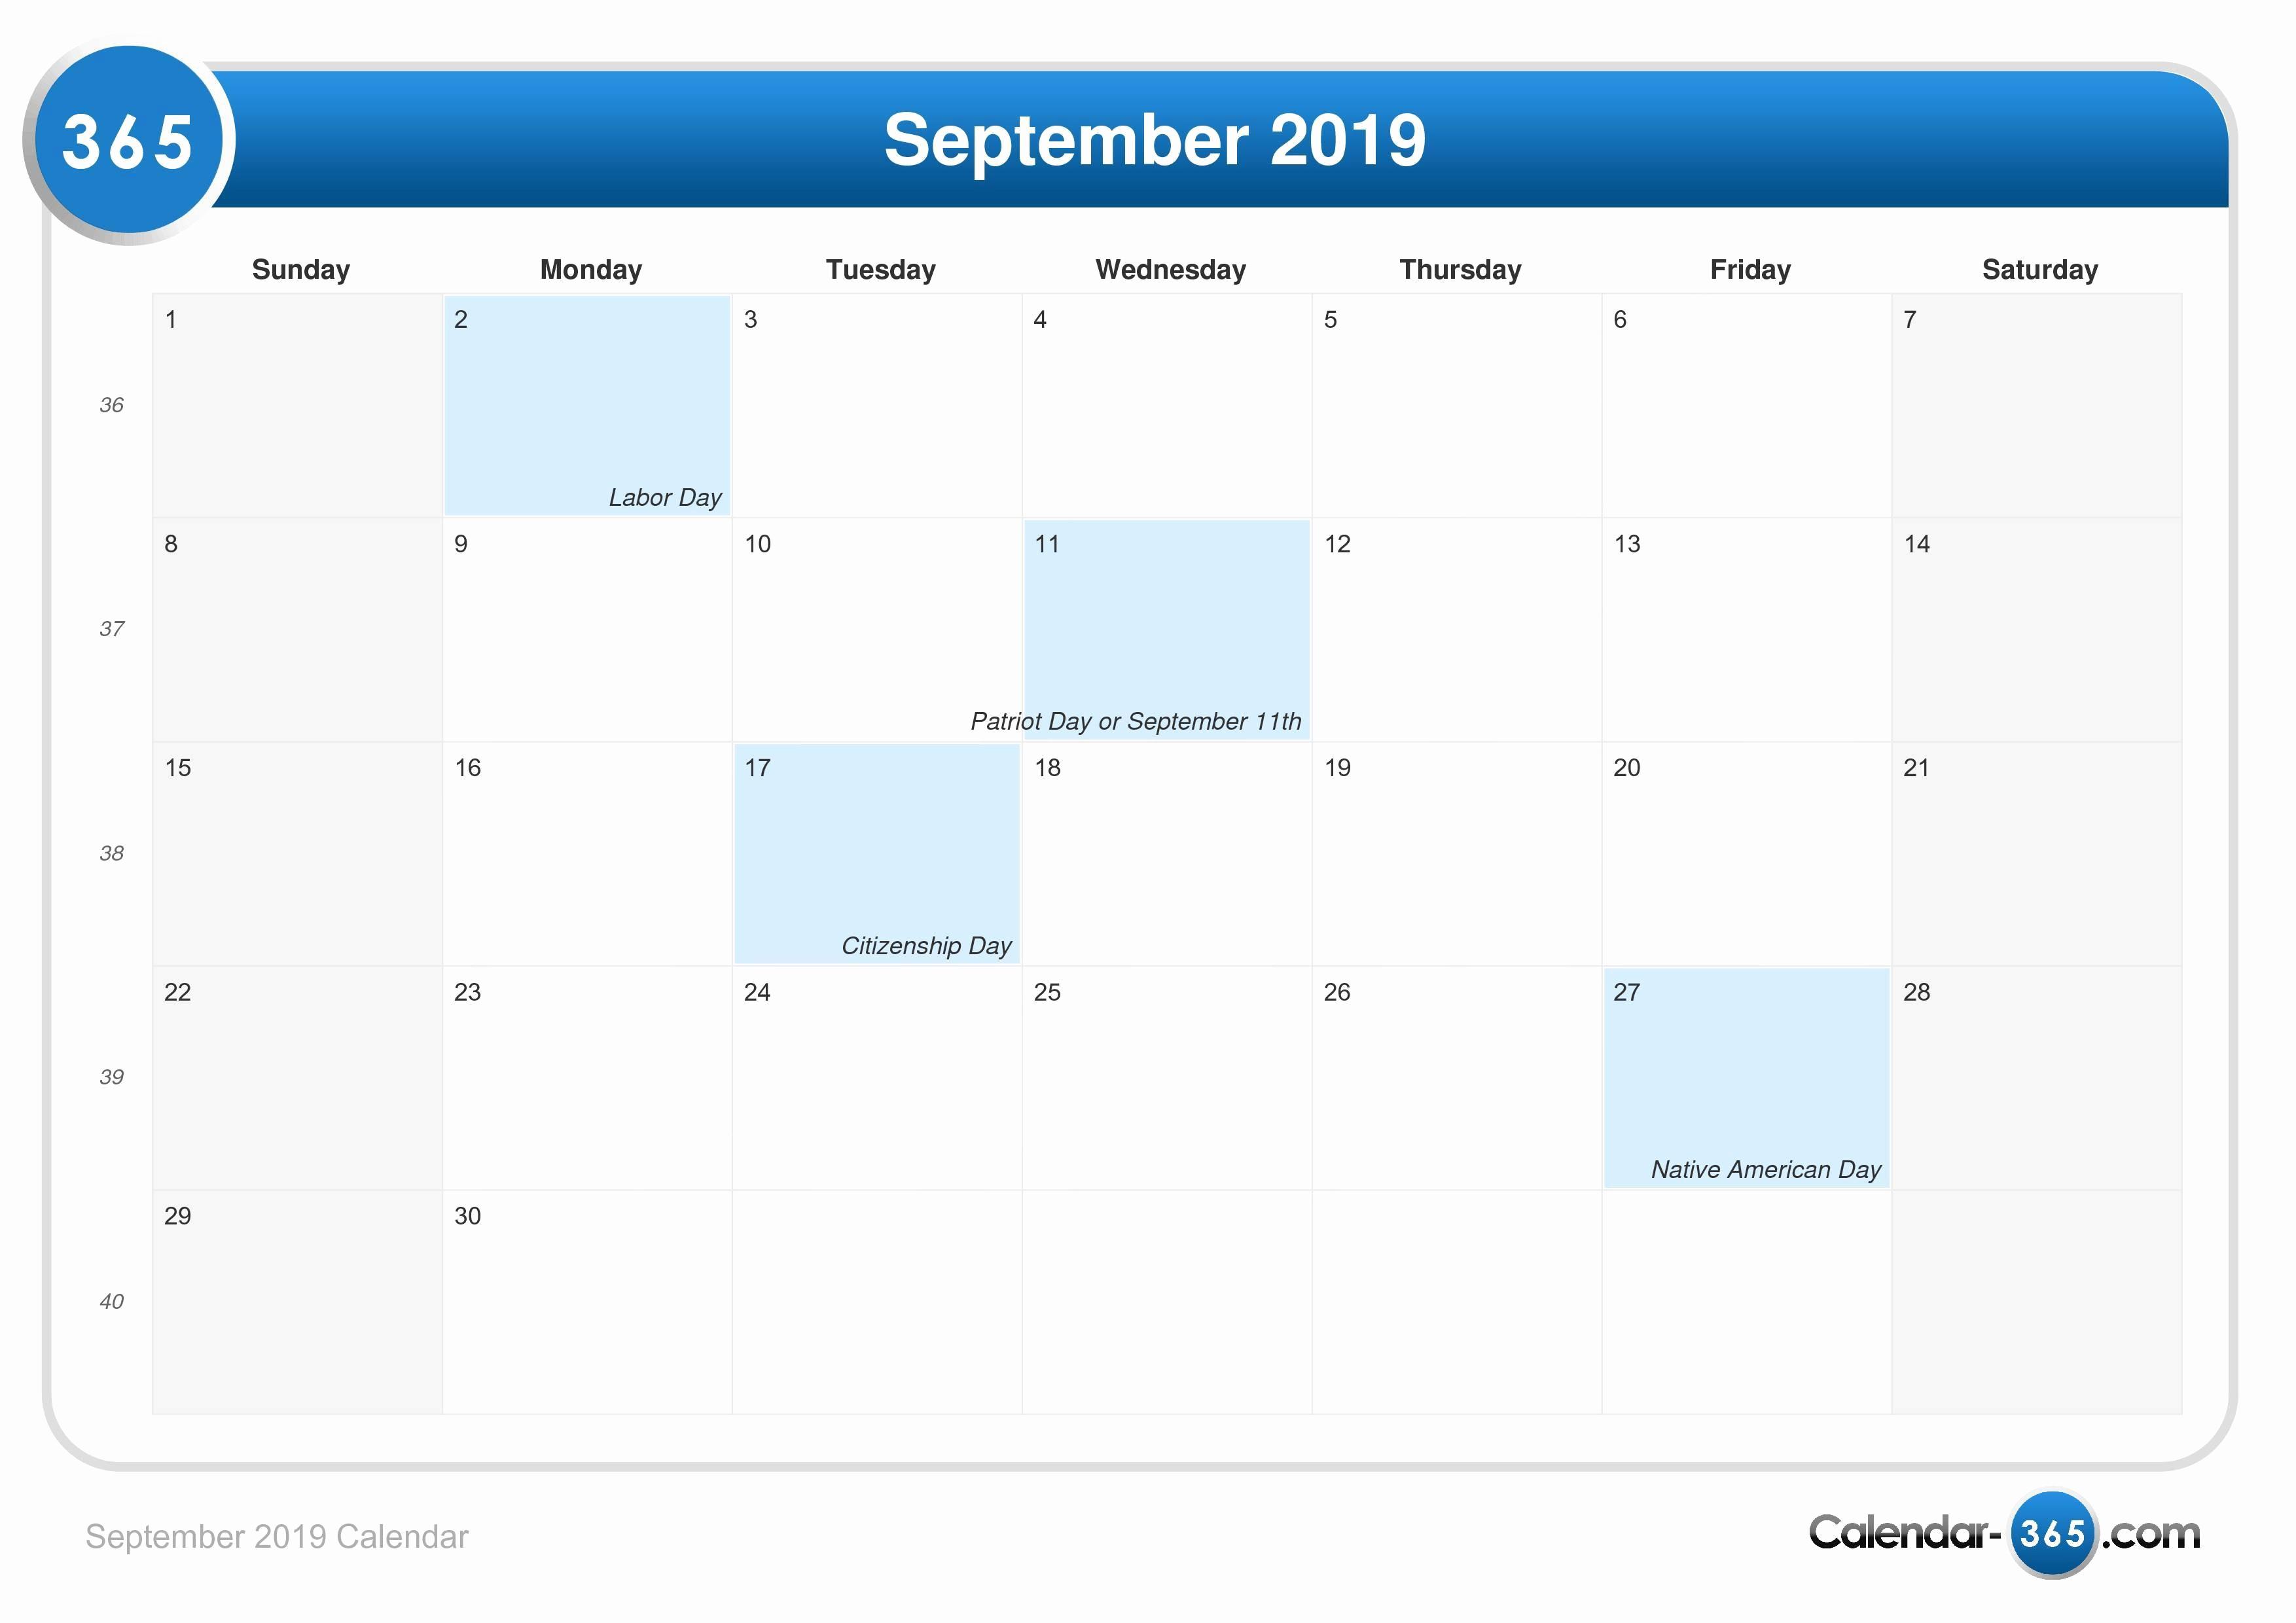 Mahalaxmi Calendars Calendar September 2018 May 2019 September 2019 Calendar With